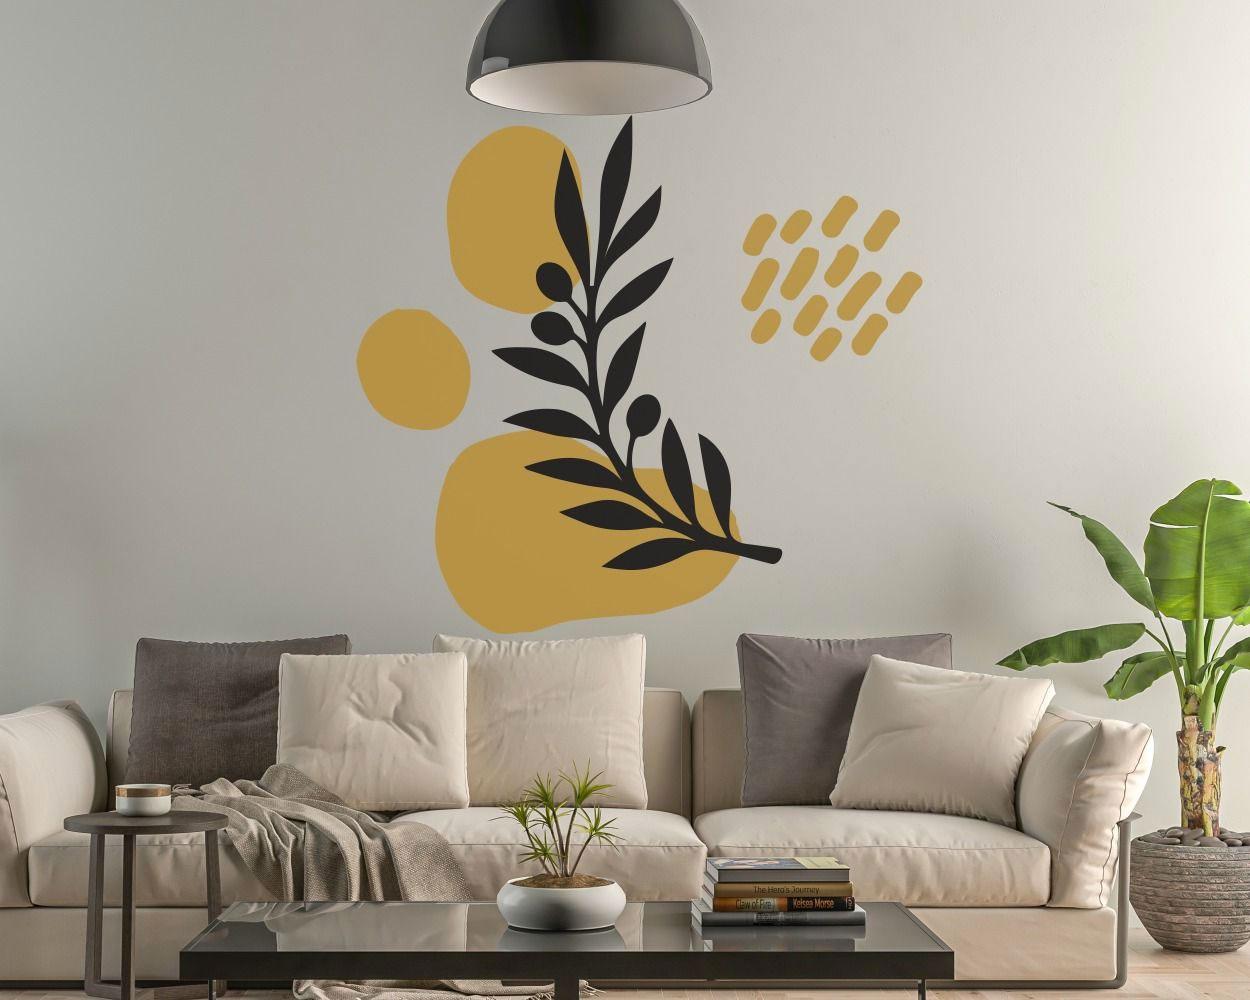 Why Buy Huetion's Boho Peel and Stick Wallpaper?